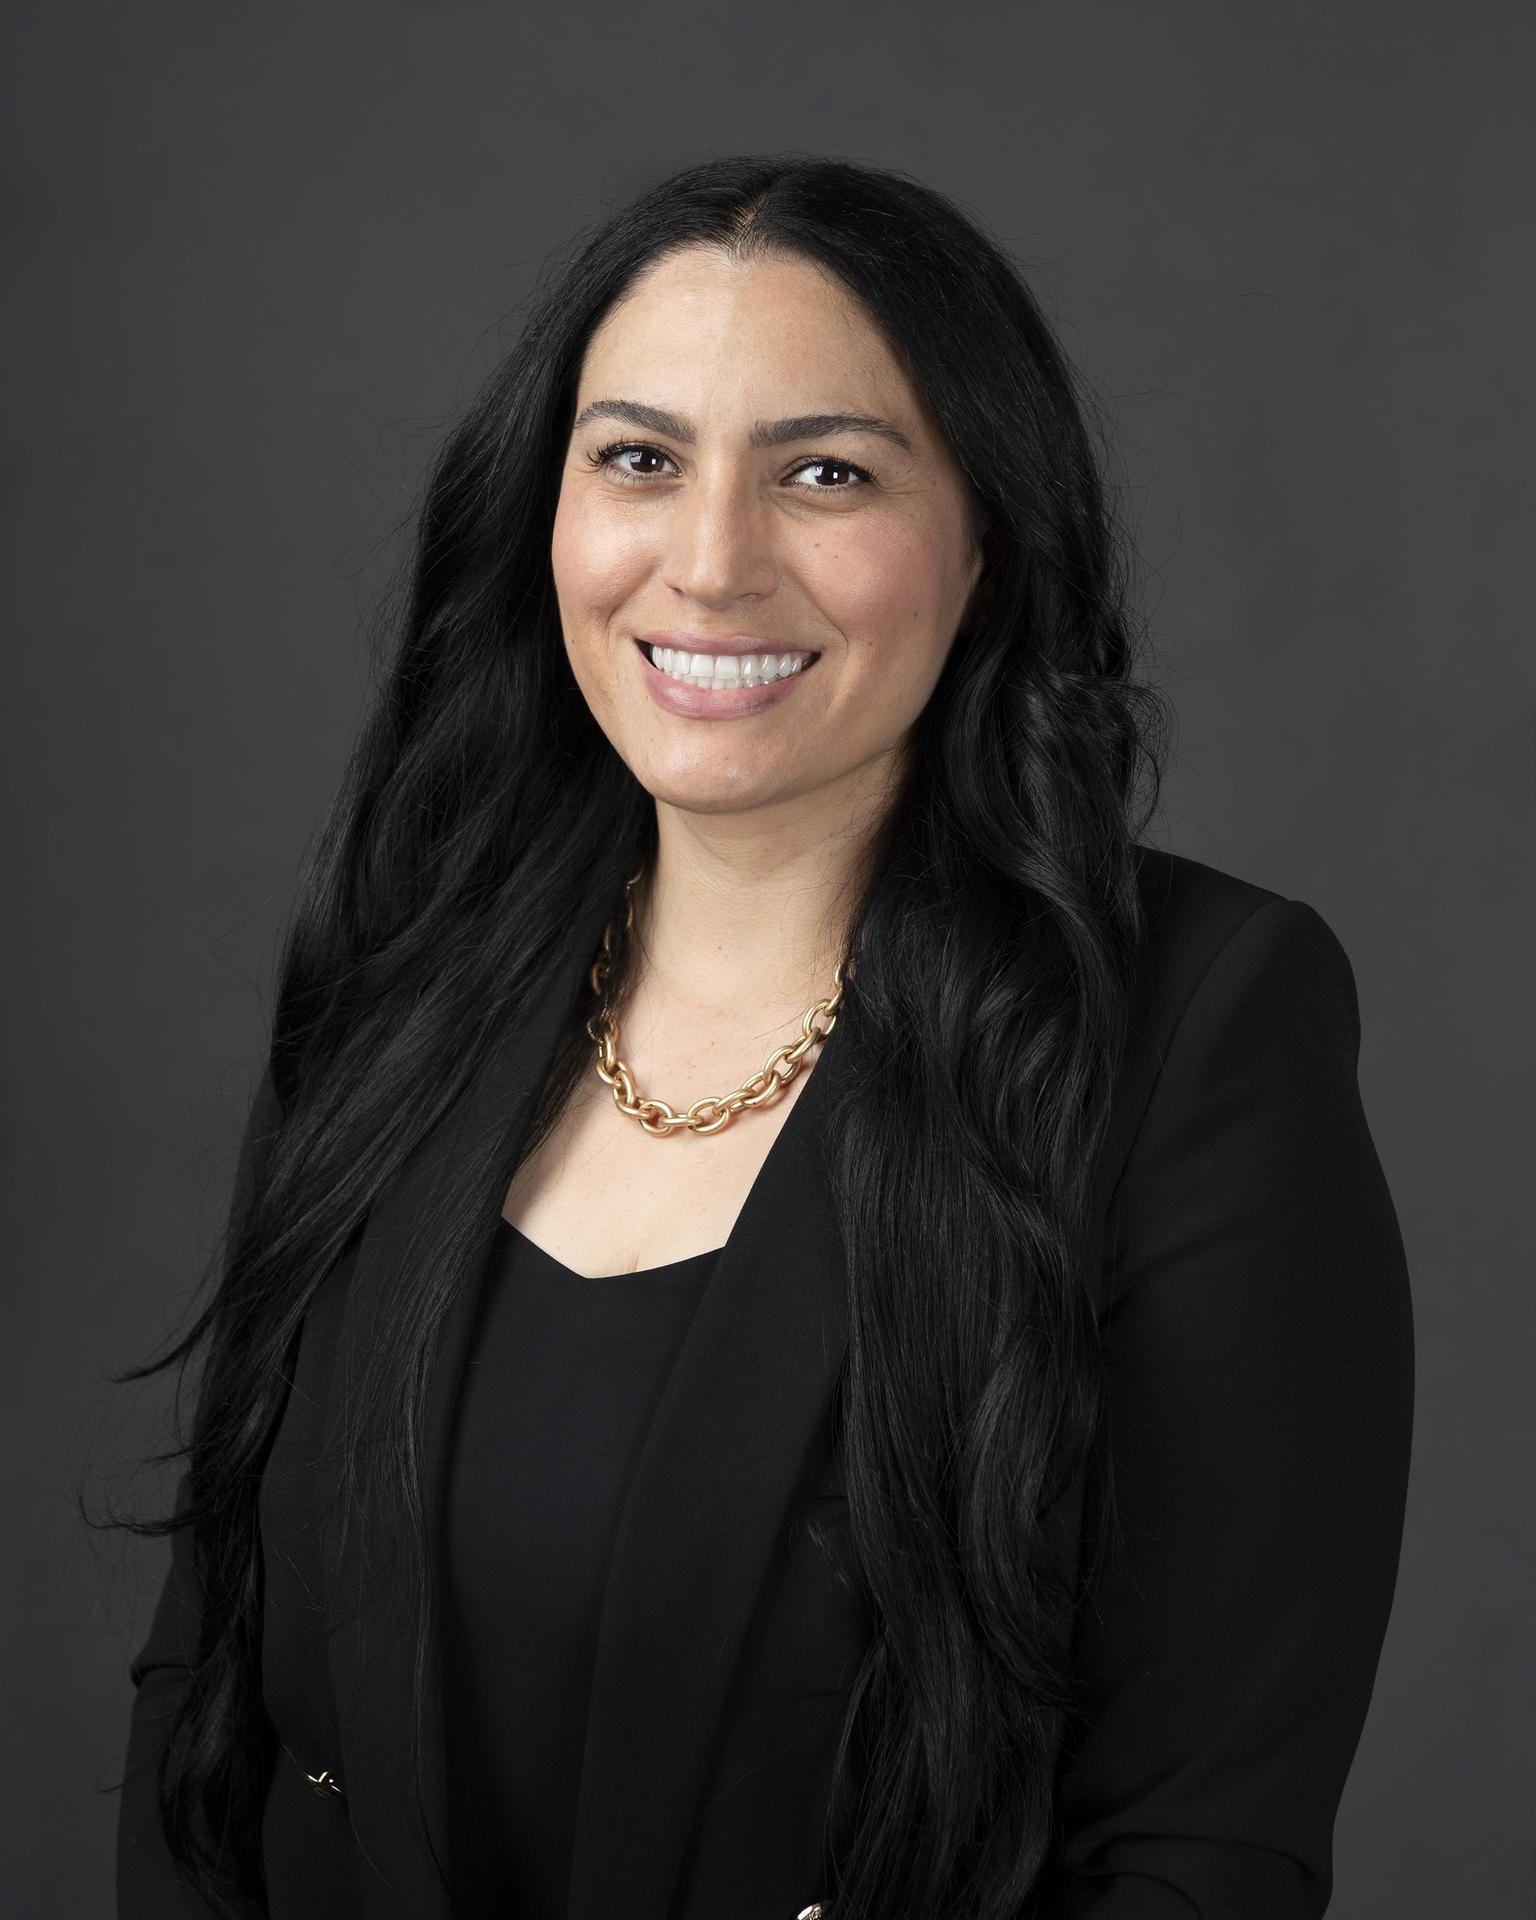 Charlene Saenz